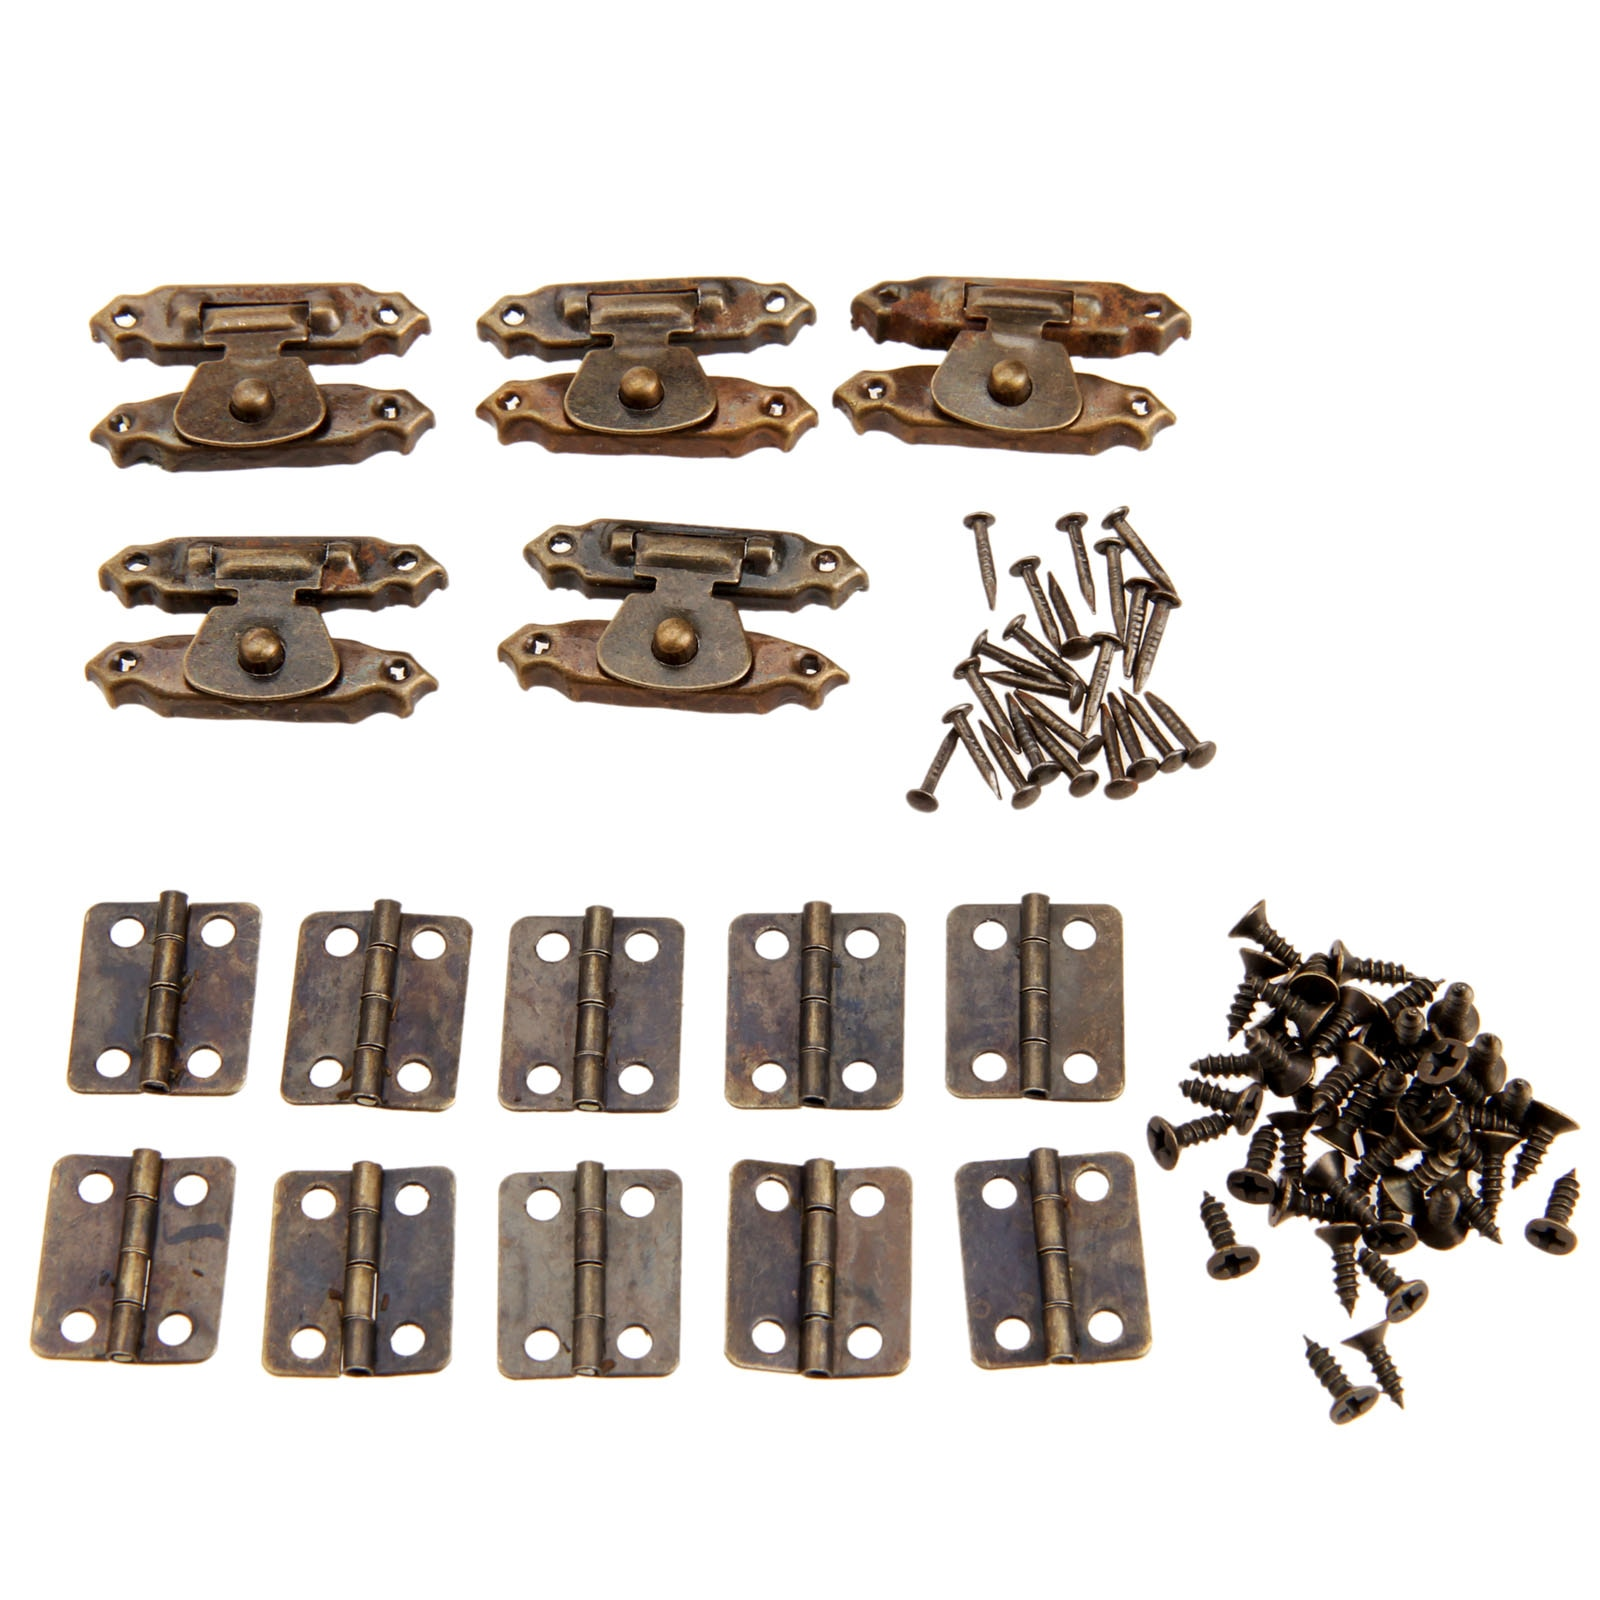 15pcs/set Antique Bronze Round Hinges Iron Decorative Vintage + Latch Hasps Jewelry Box Toggle Lock